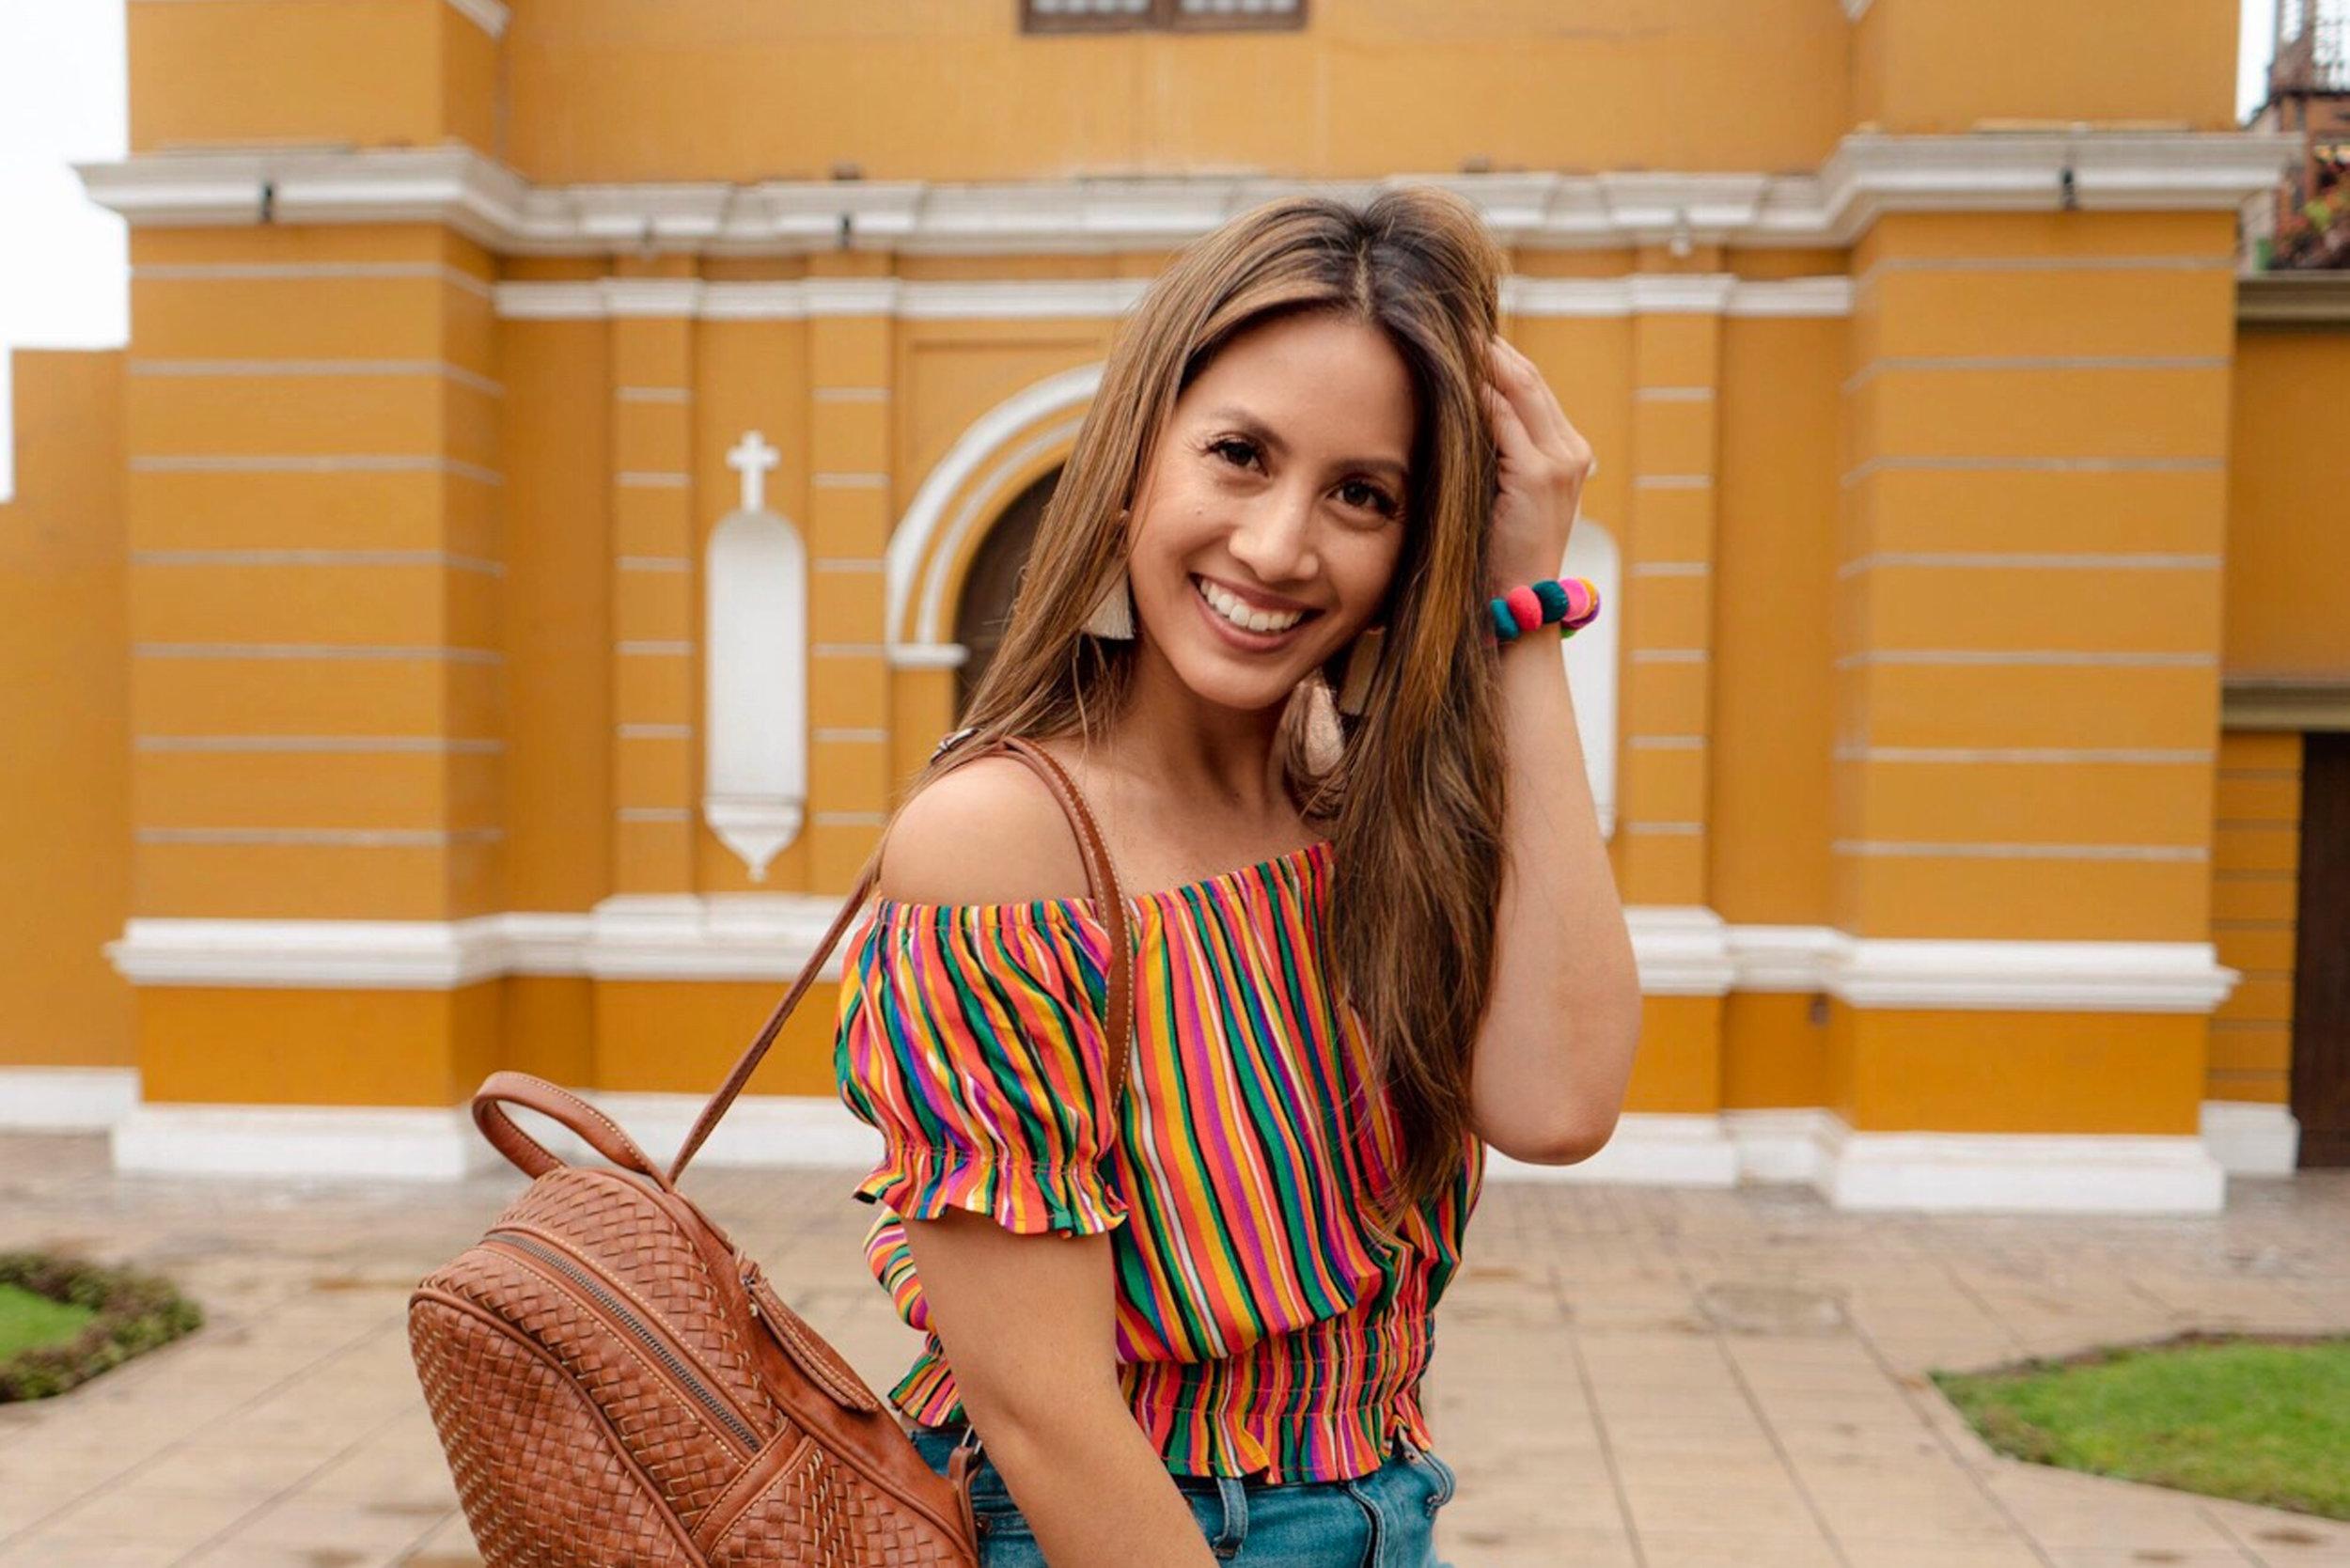 Blog_barranco 4.jpg